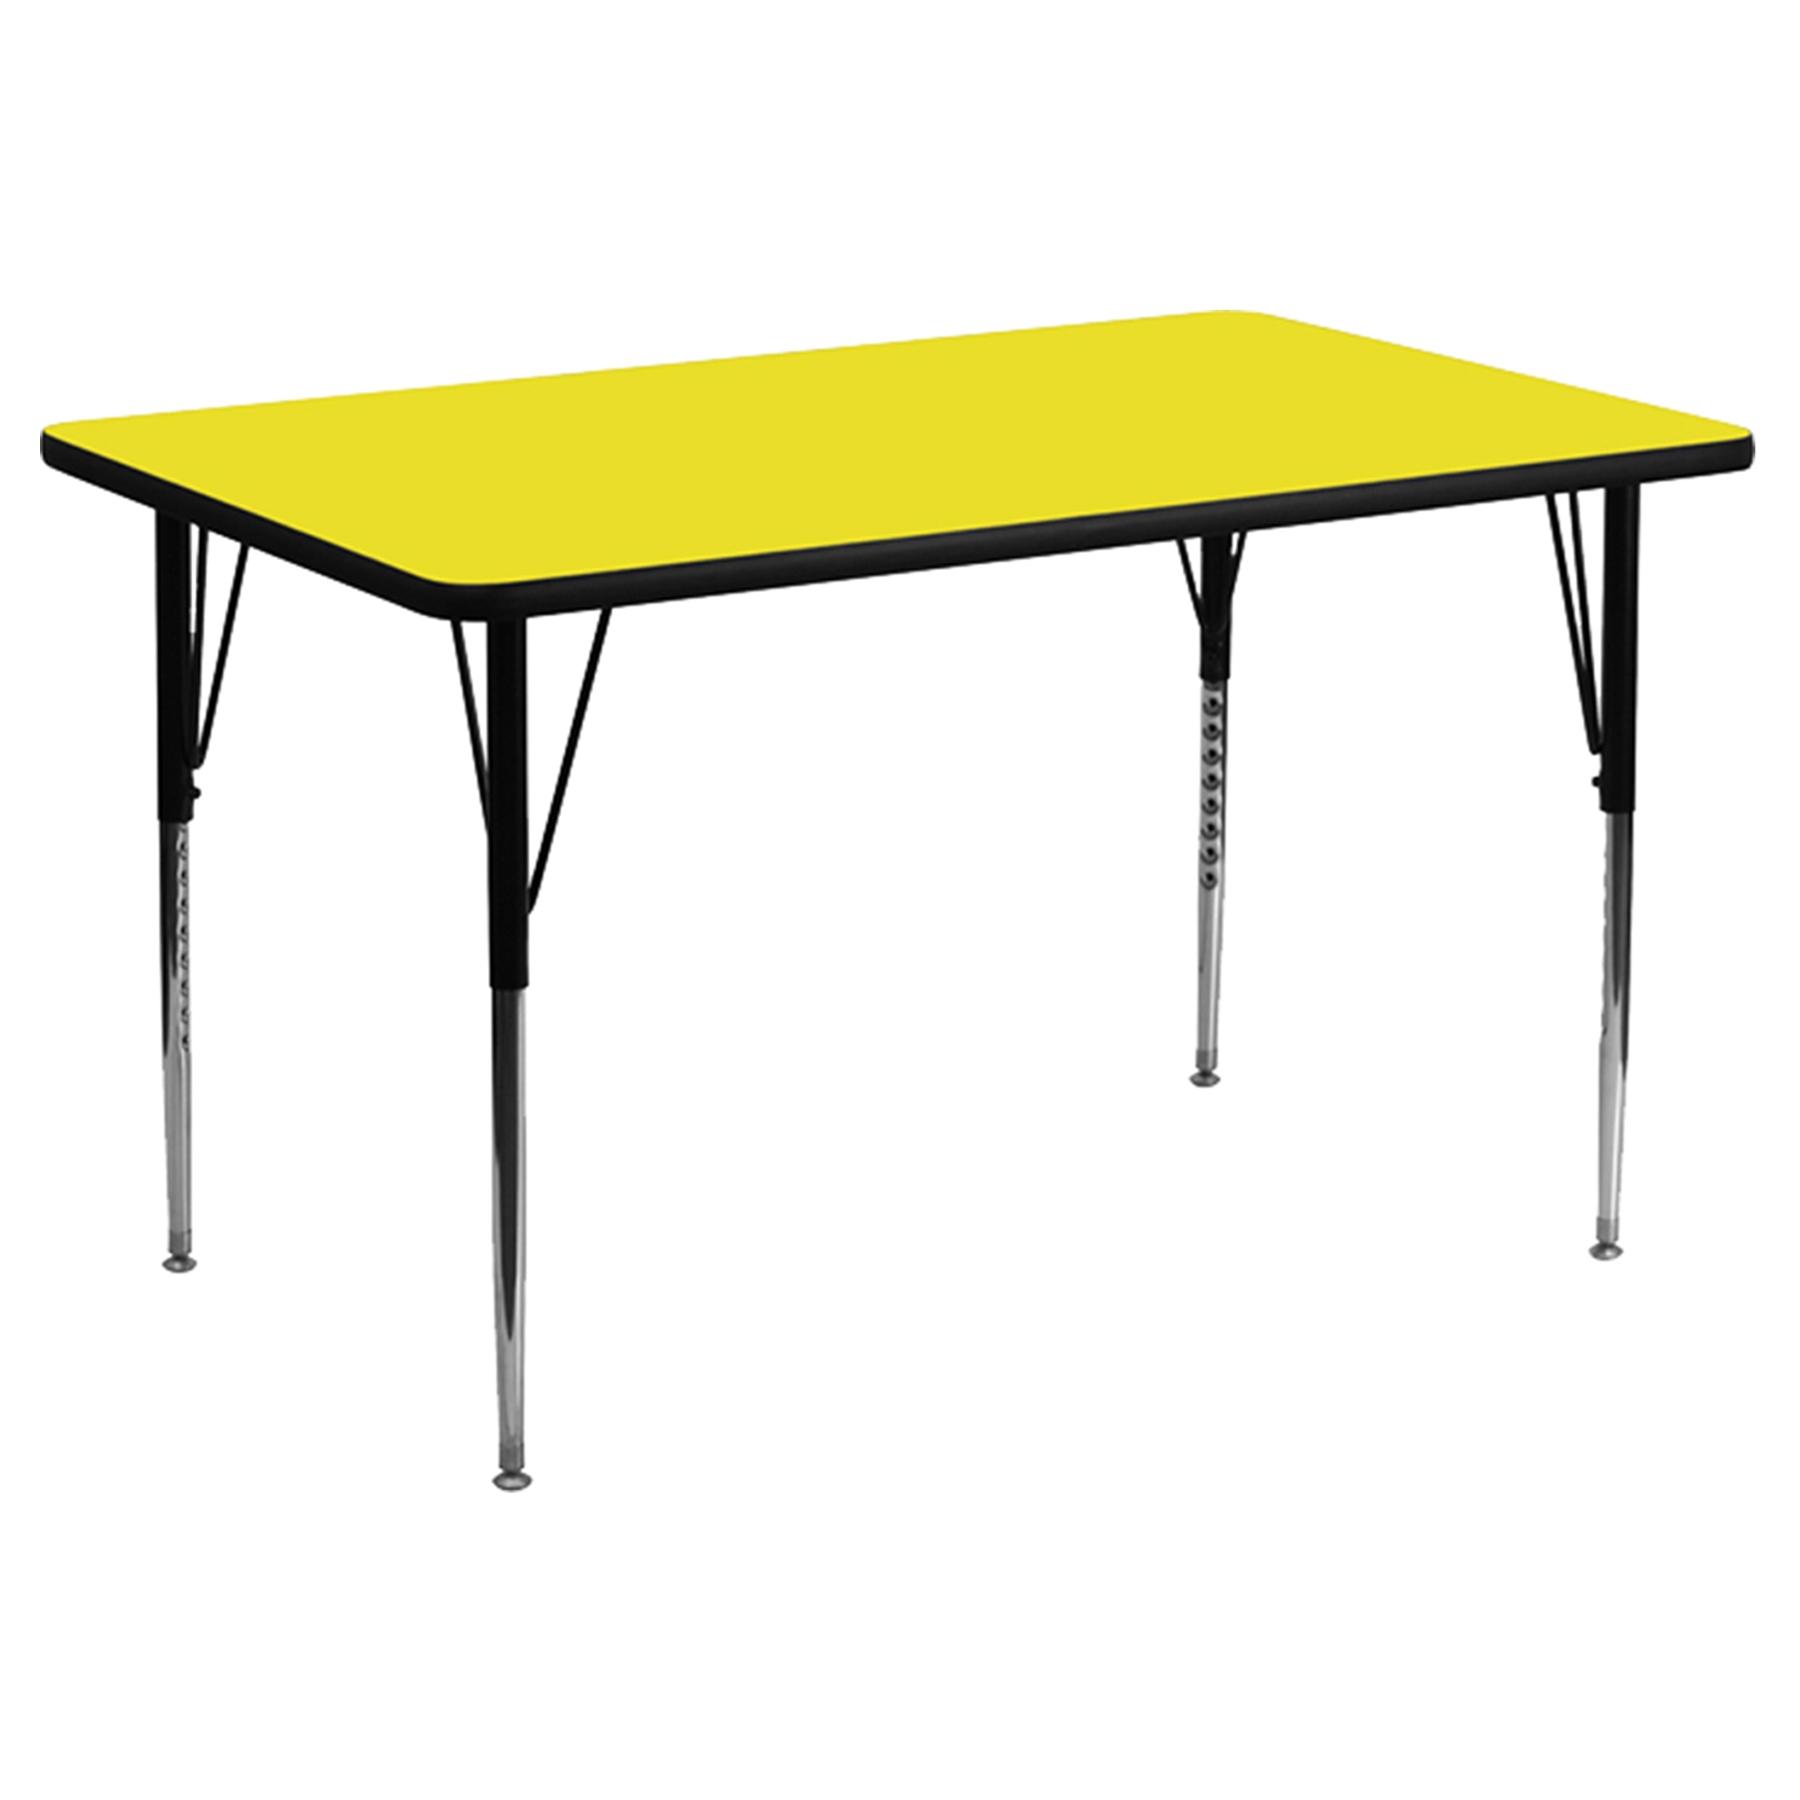 24 X 48 Activity Table Get Home Inteiror House Design Inspiration